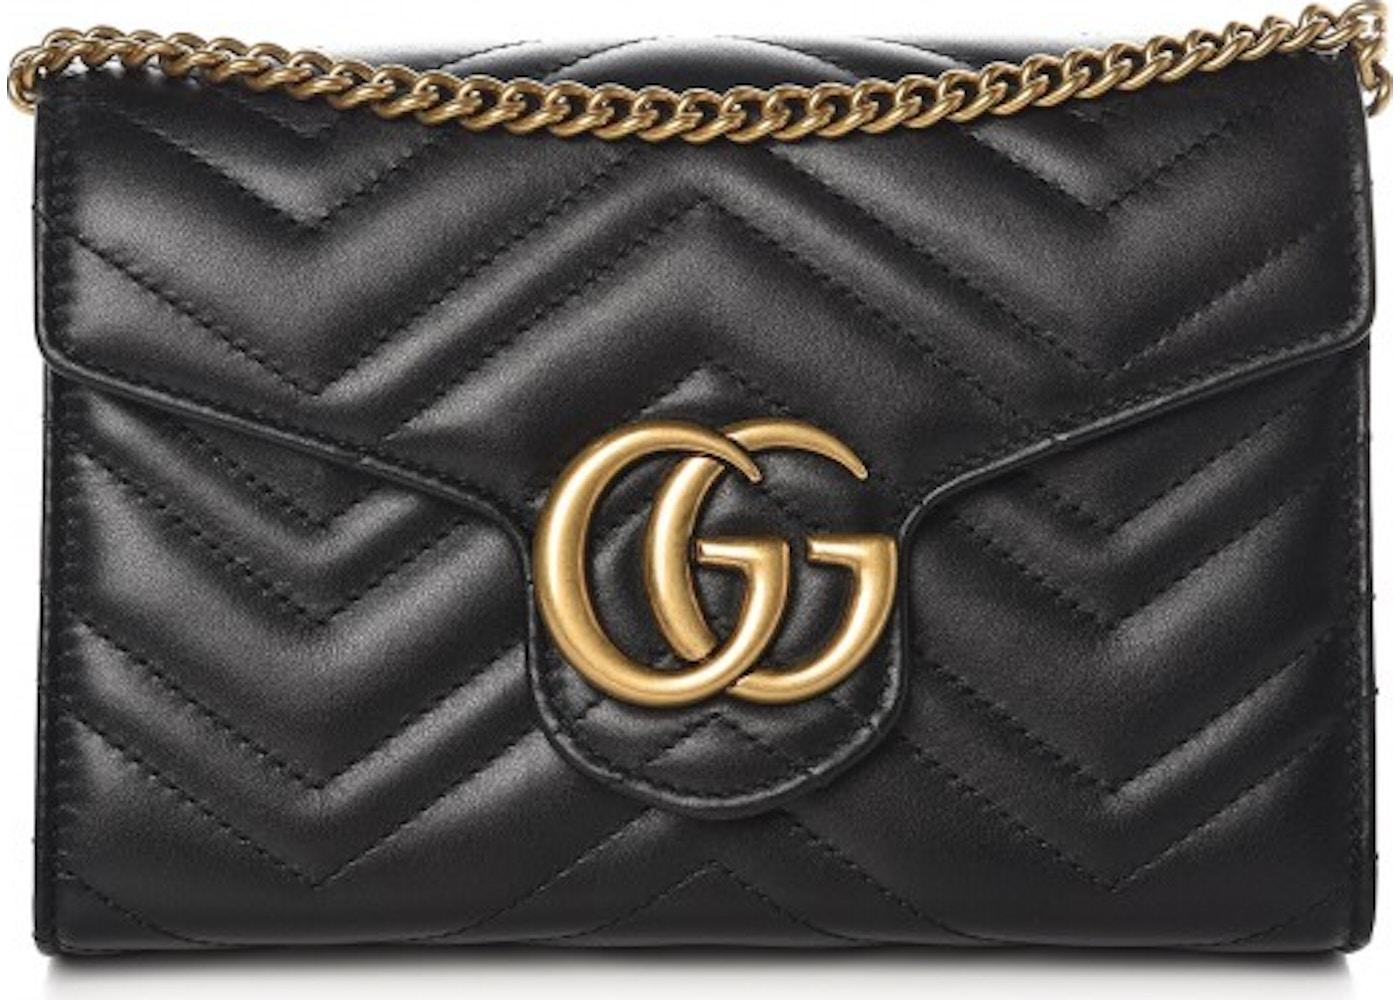 437f01abf38 Gucci Marmont Wallet on Chain Matelasse Black. Matelasse Black